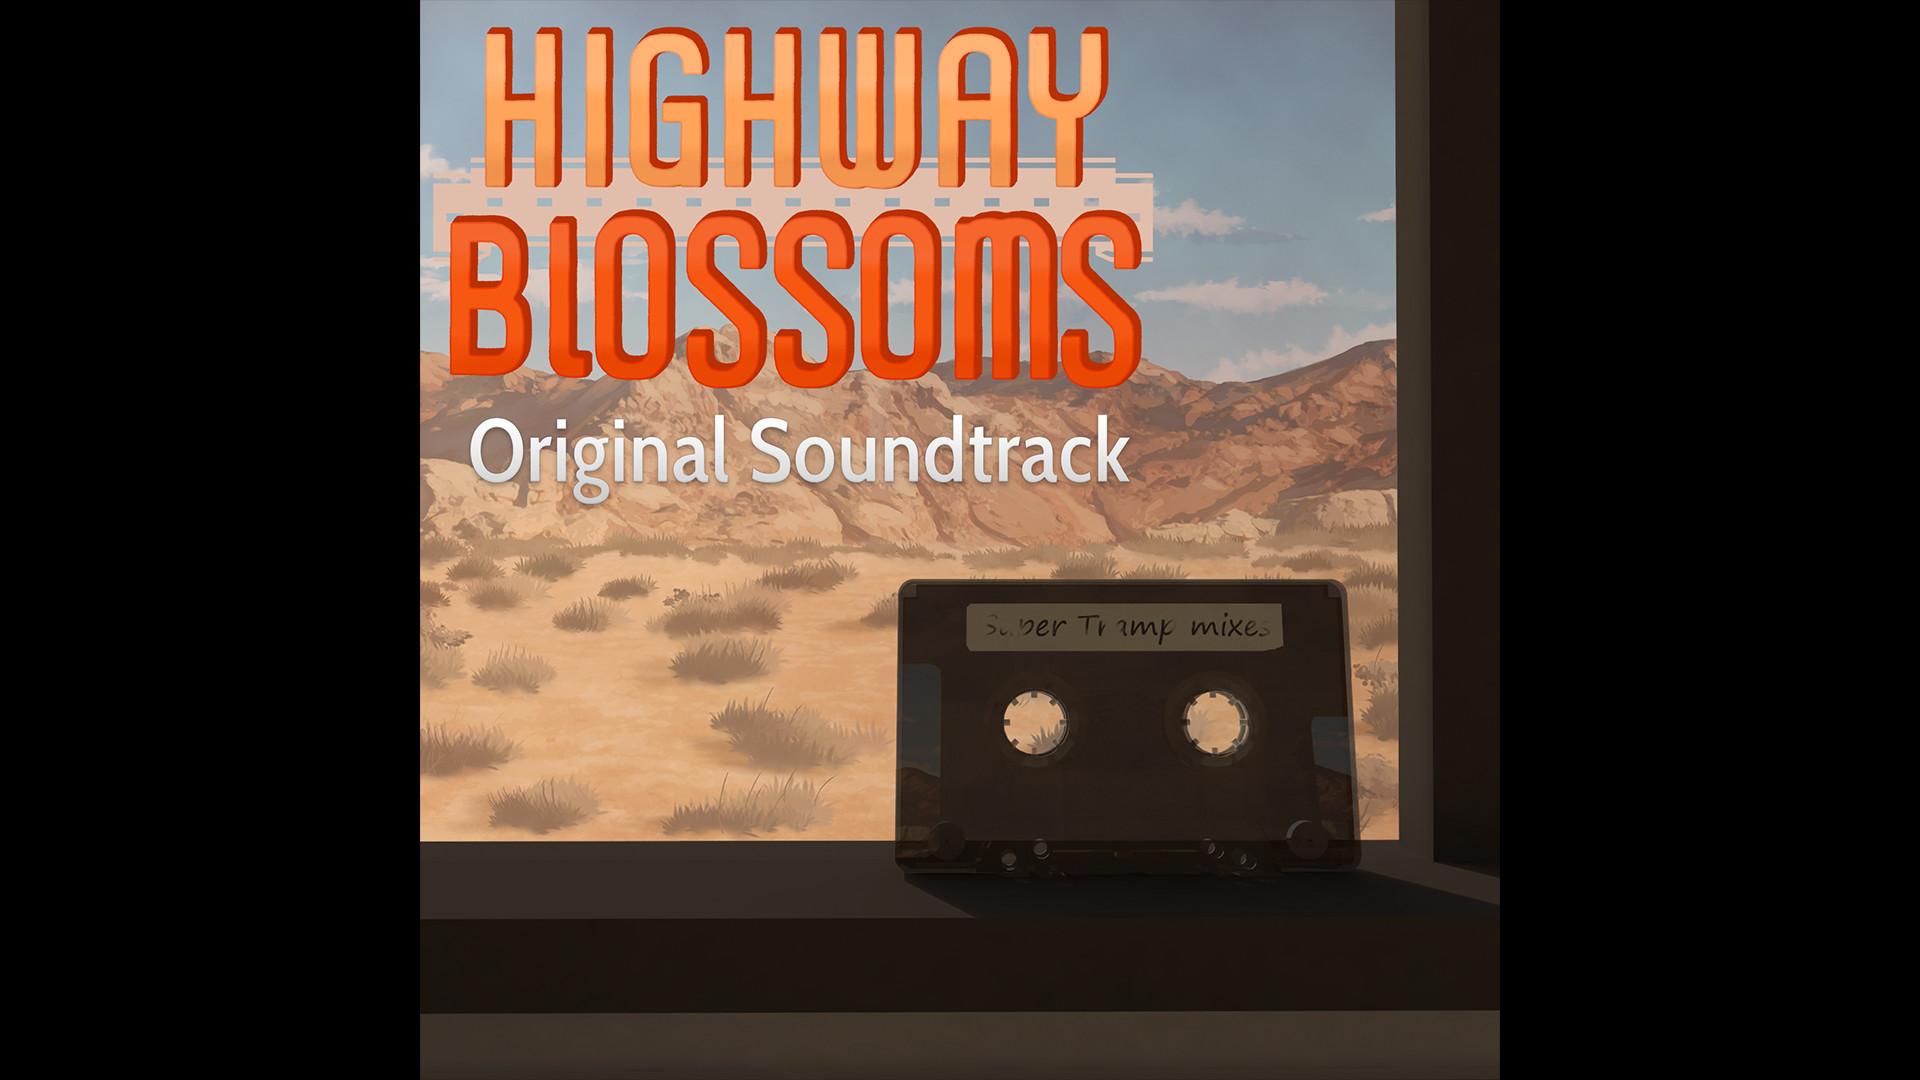 Highway Blossoms - Soundtrack screenshot